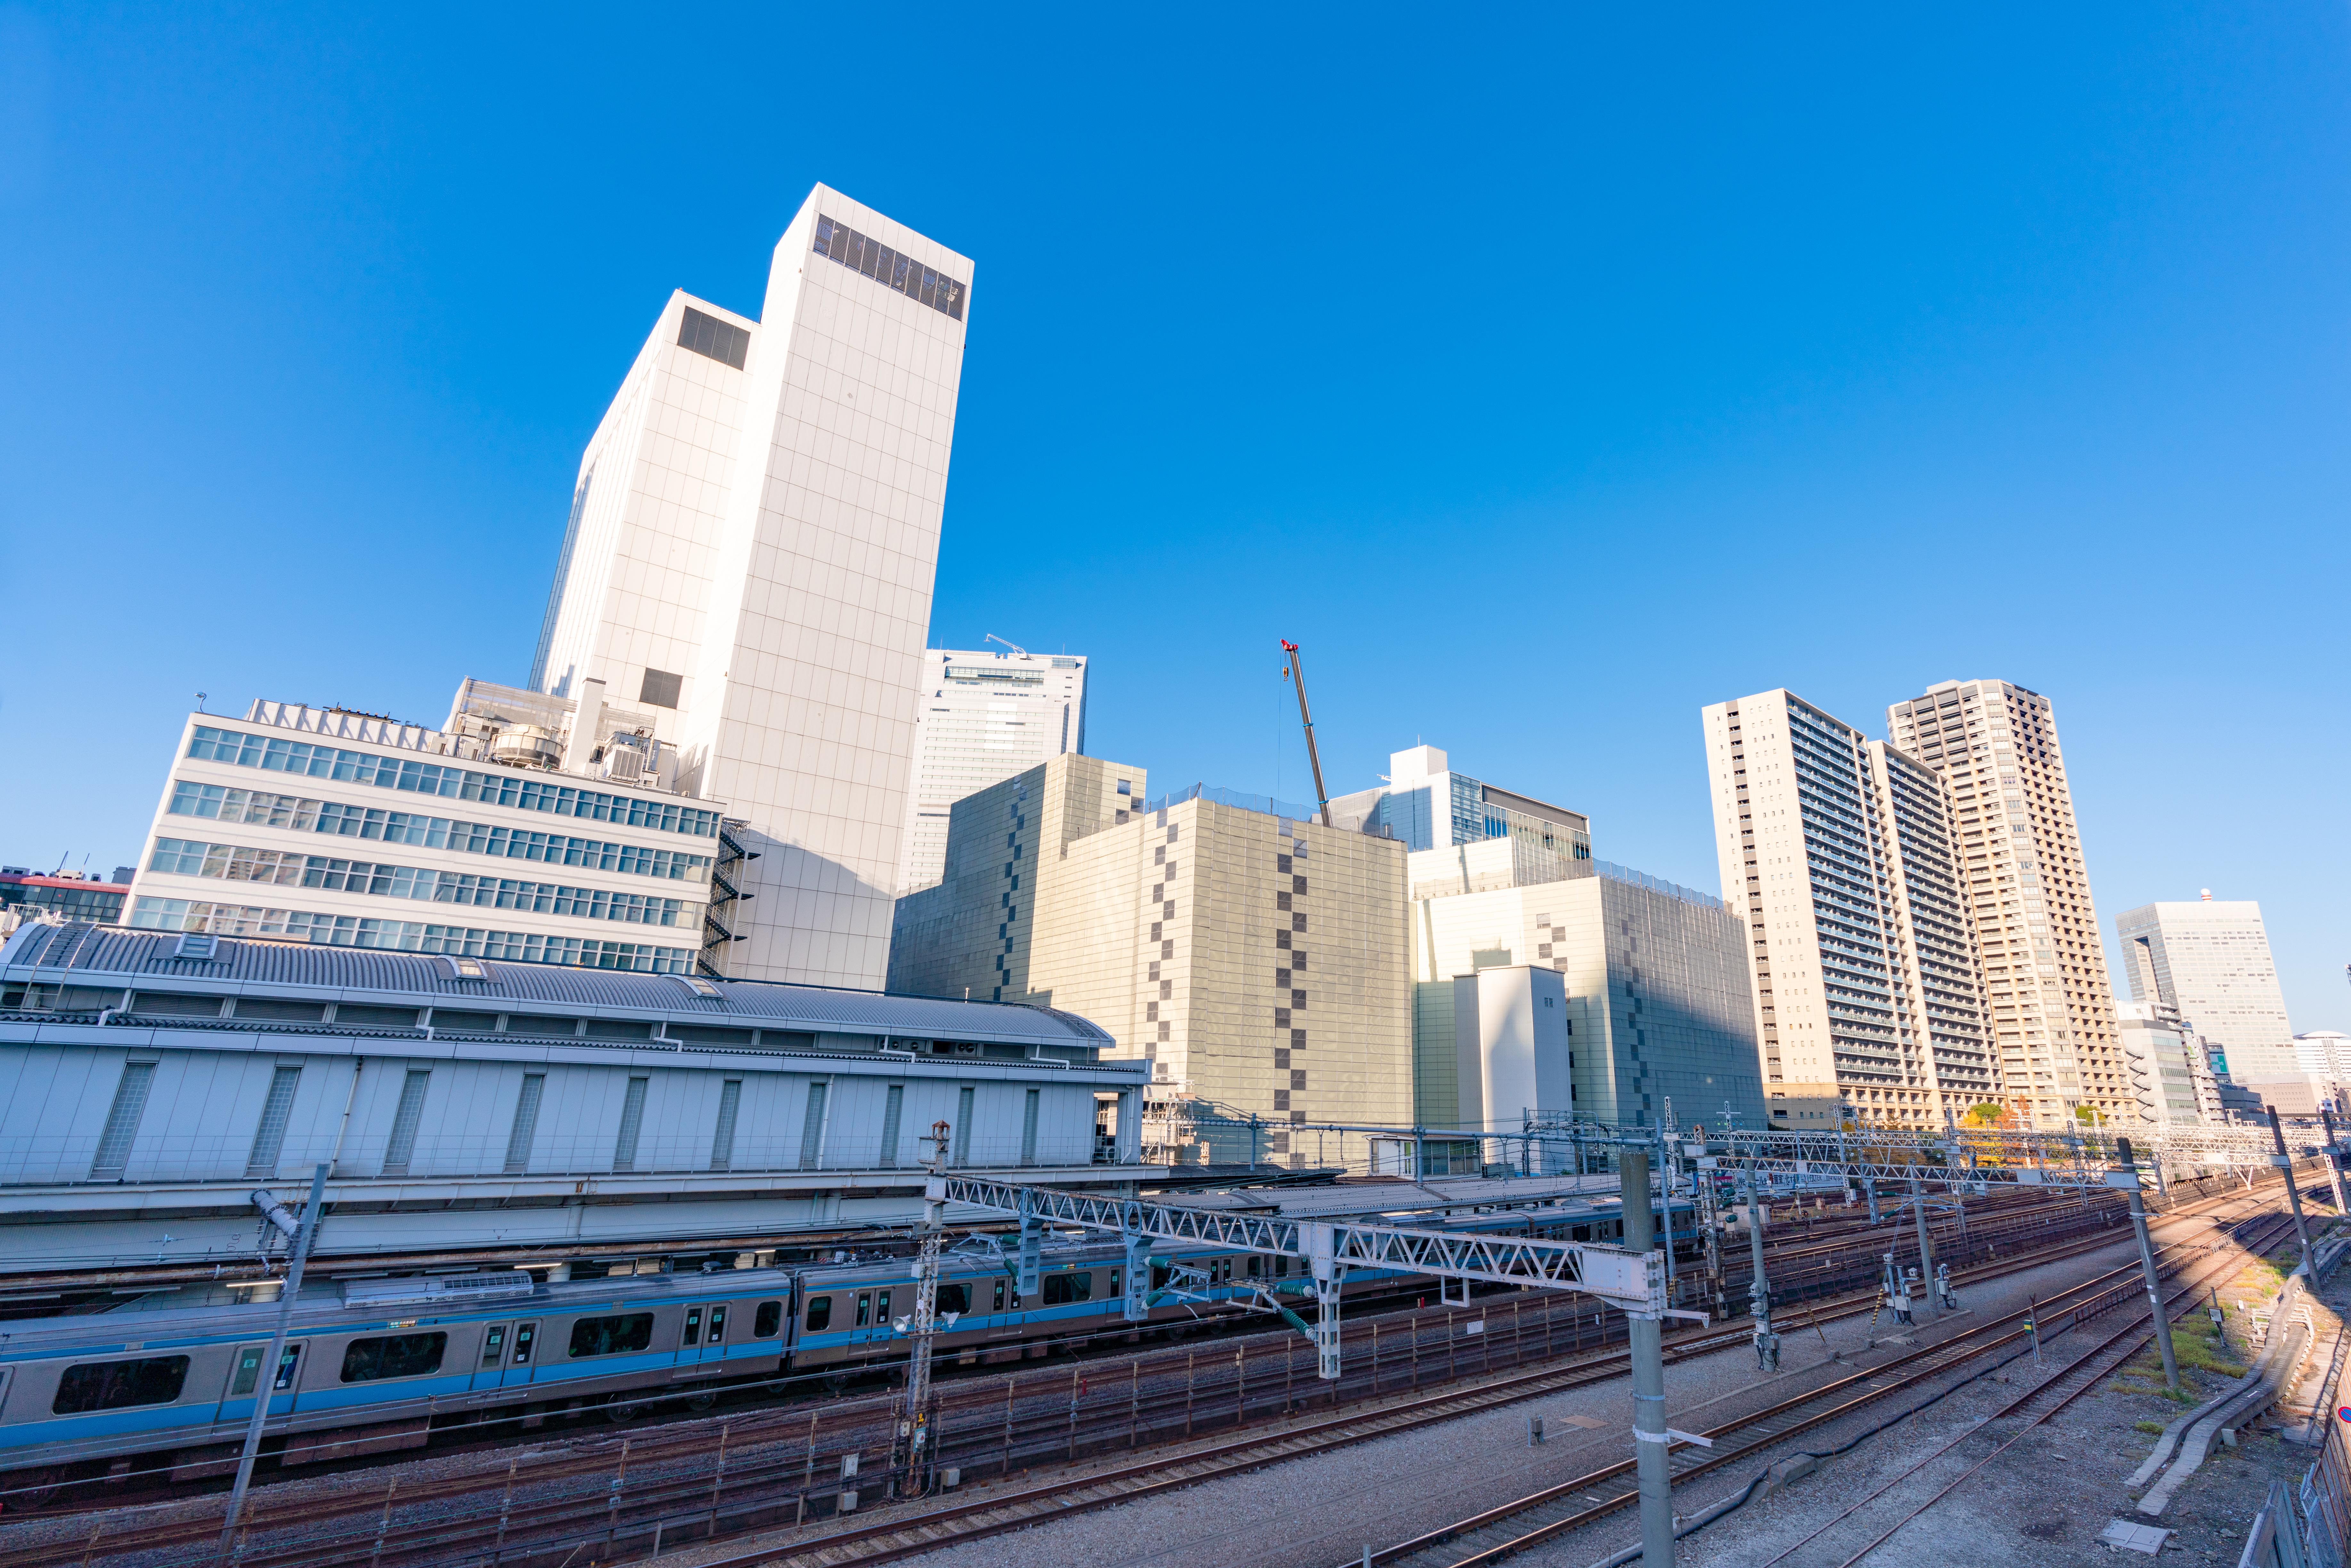 田町駅の線路写真